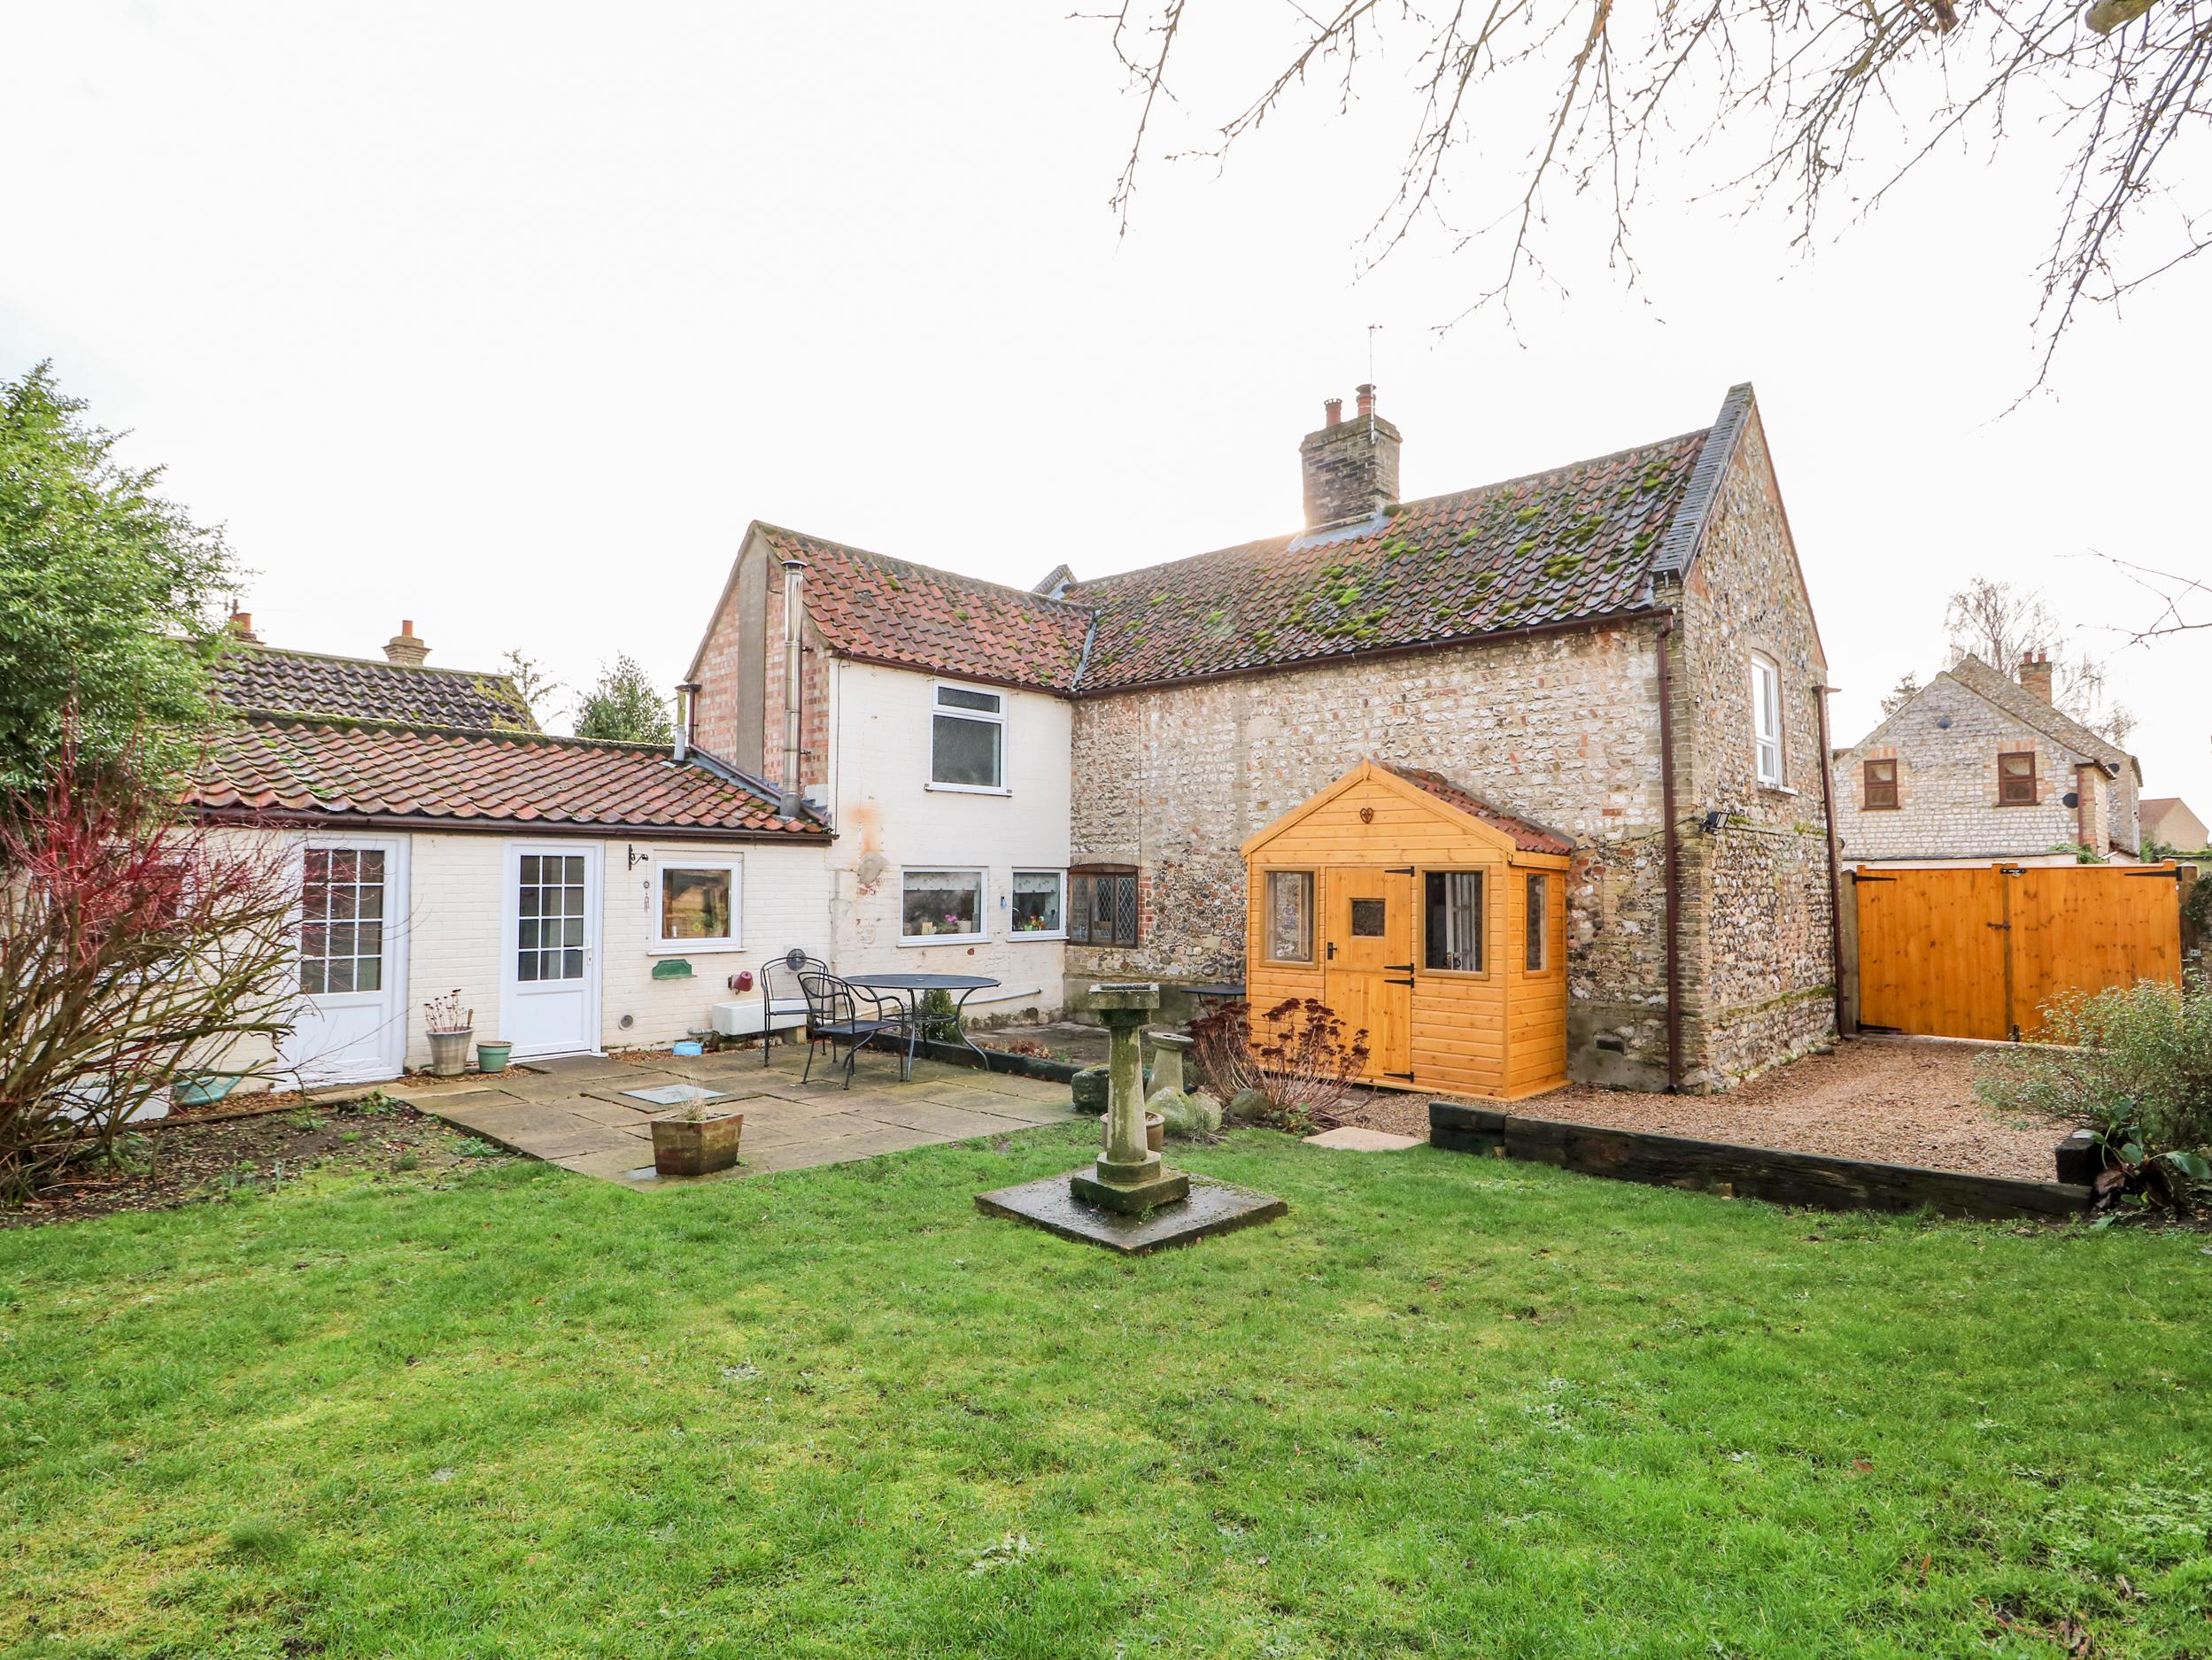 3 bedroom Cottage for rent in Downham Market